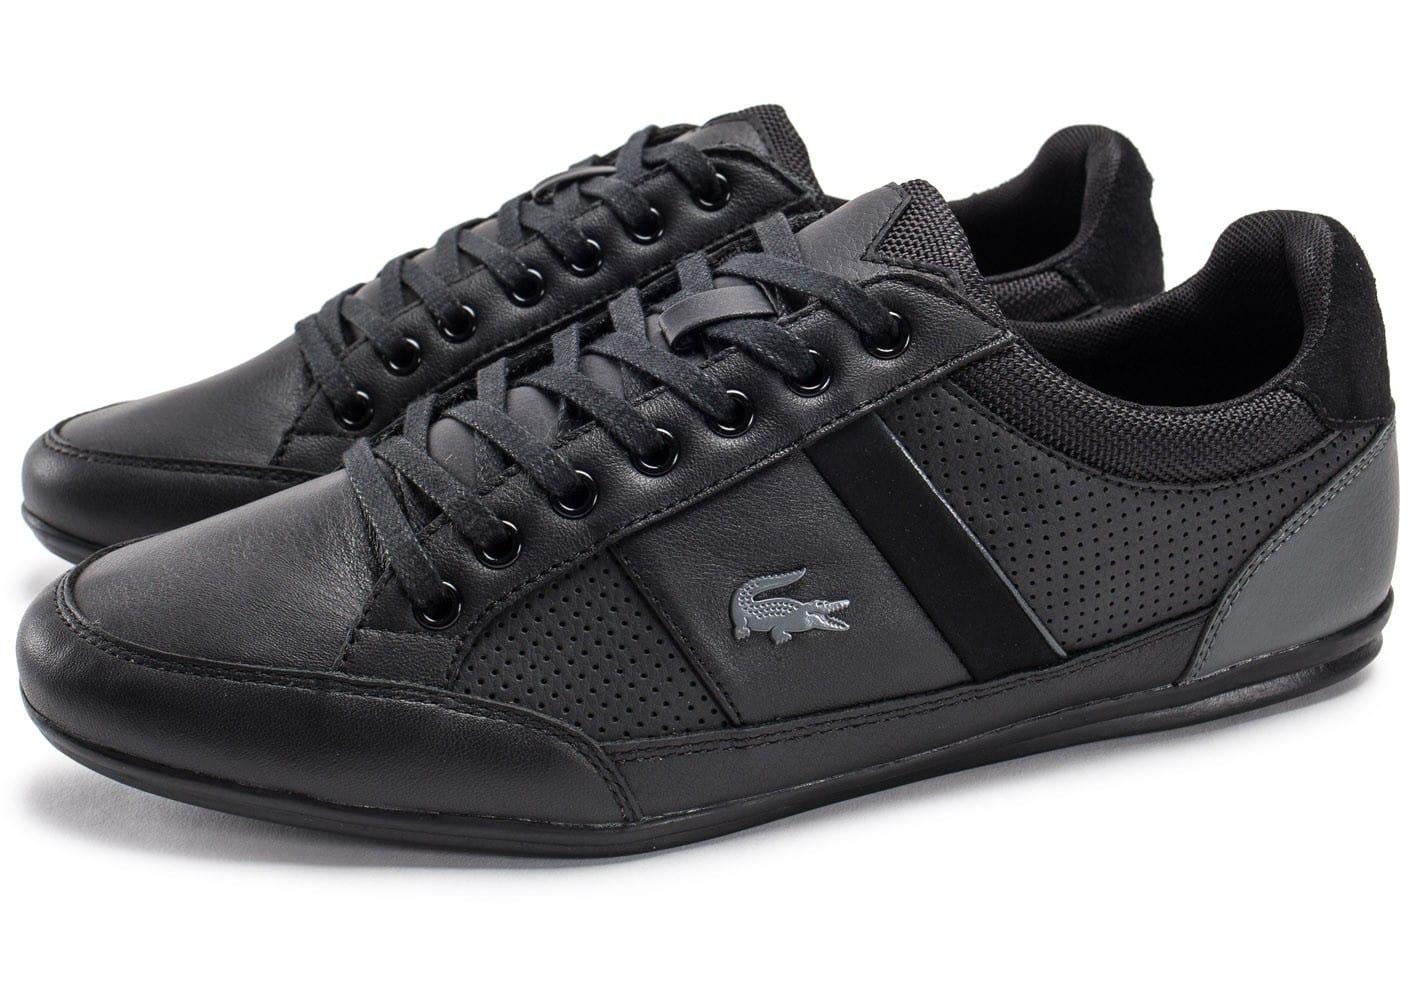 10d66e72edc chaussure lacoste chaymon 1